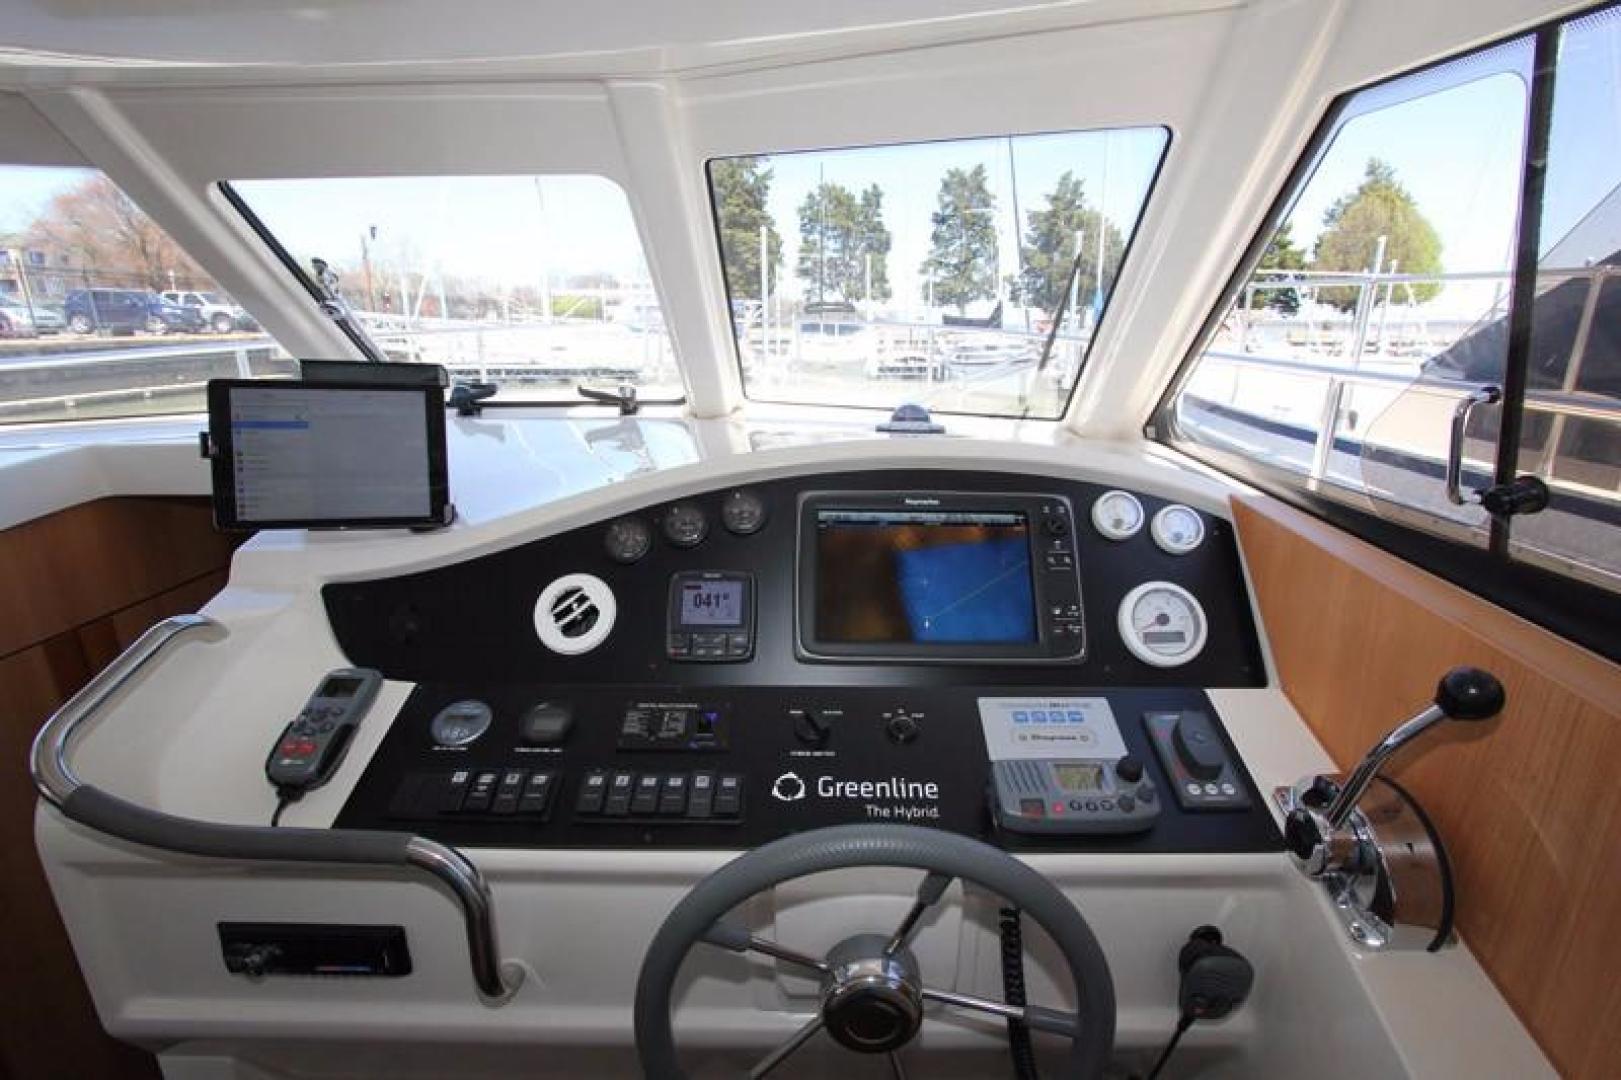 Greenline-33 300 2014-Inspiration Annapolis-Maryland-United States-Helm-923127 | Thumbnail